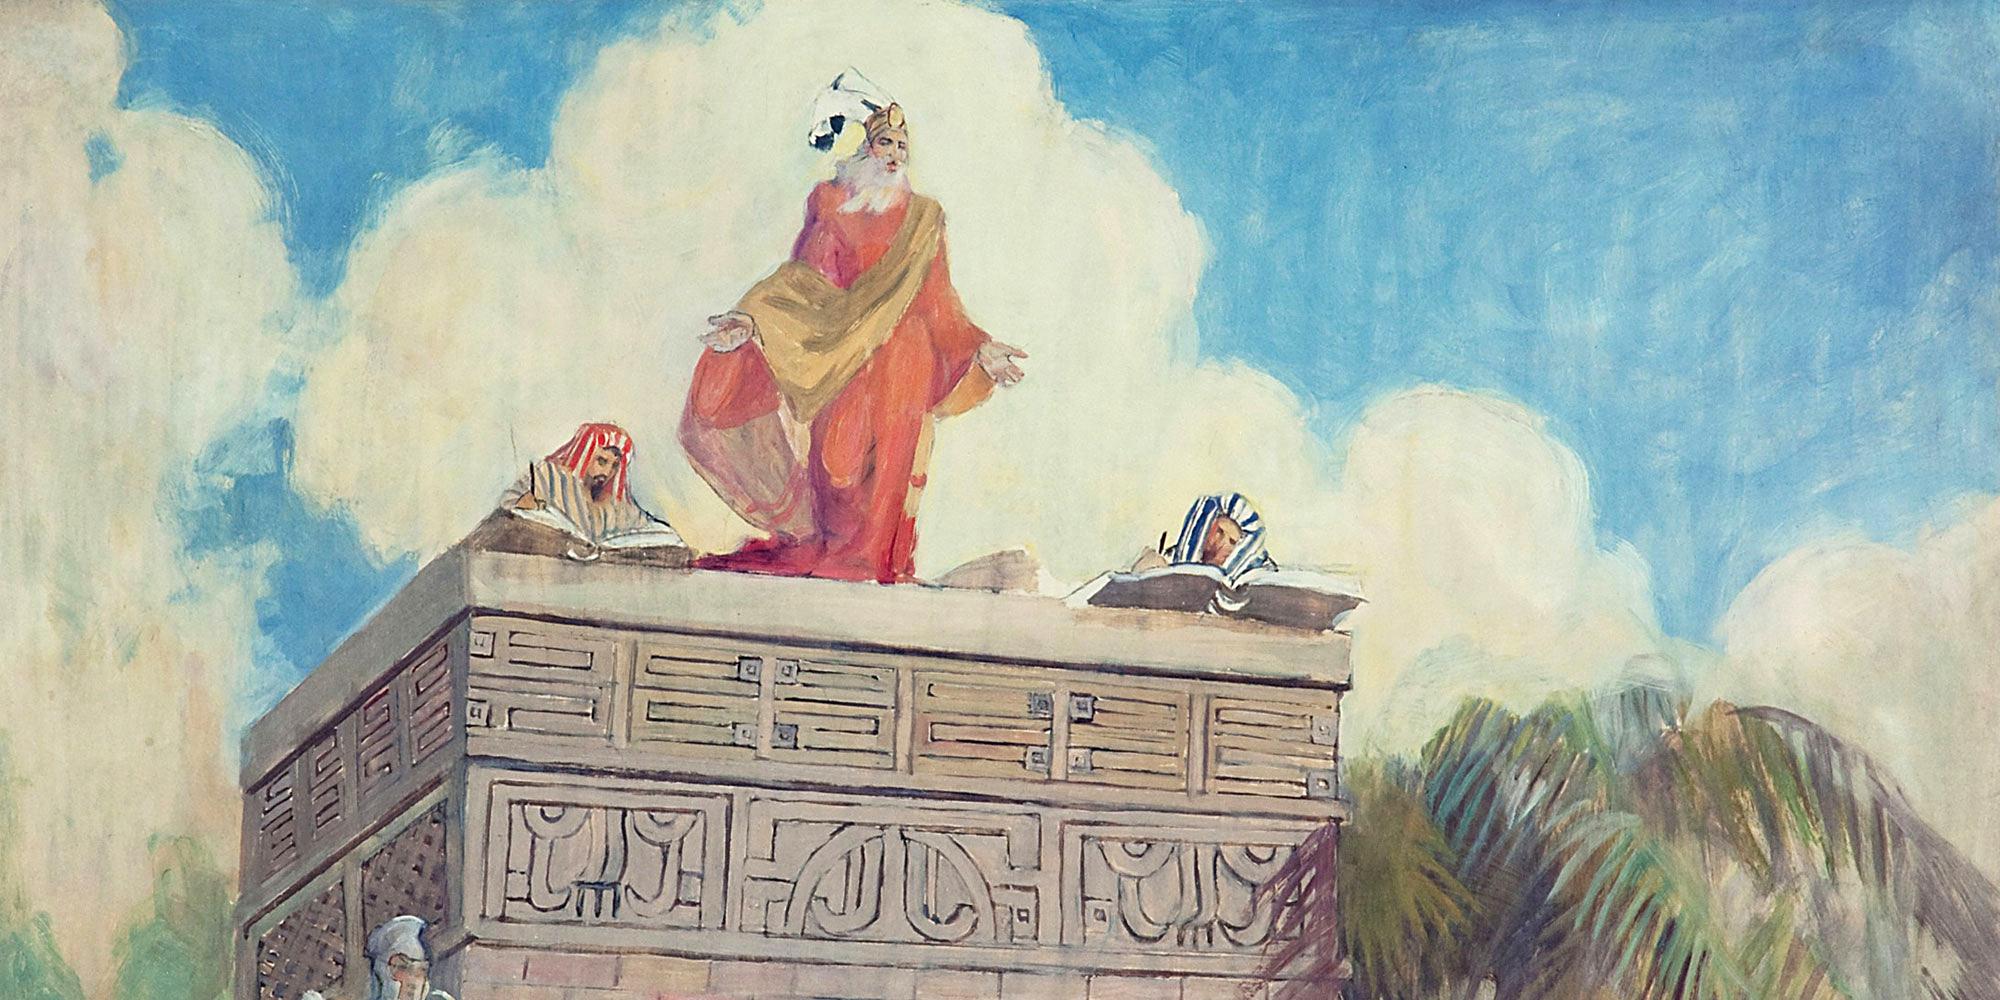 Minerva Teichert Paintings LDS art BYU21.jpg